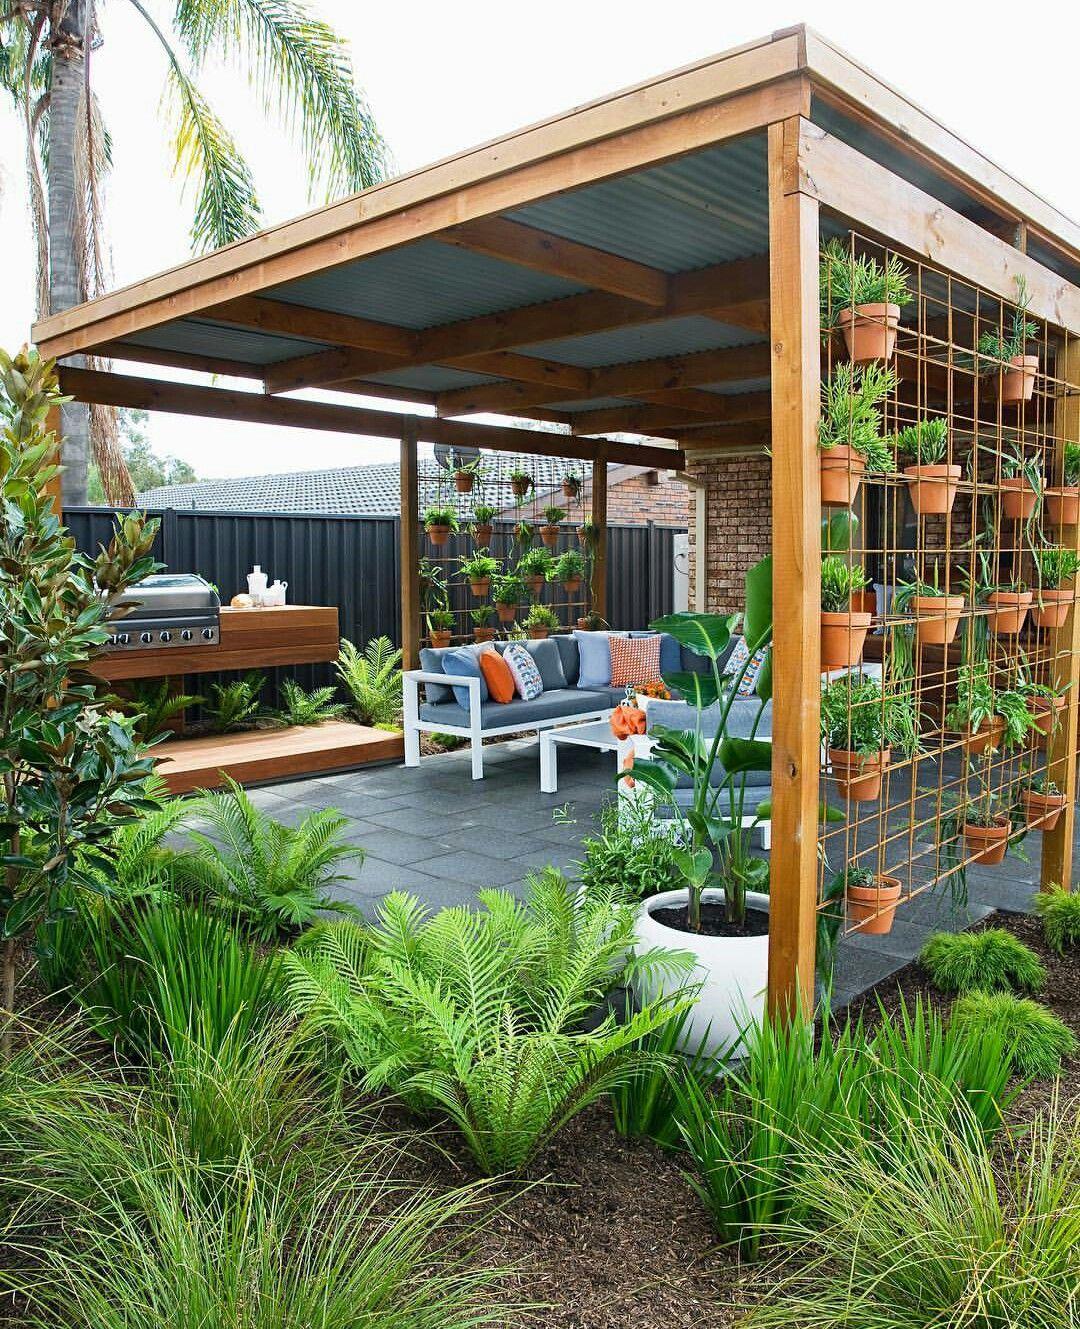 So Nice Backyard Design Backyard Garden Design Backyard Patio Backyard landscaping ideas with pergola